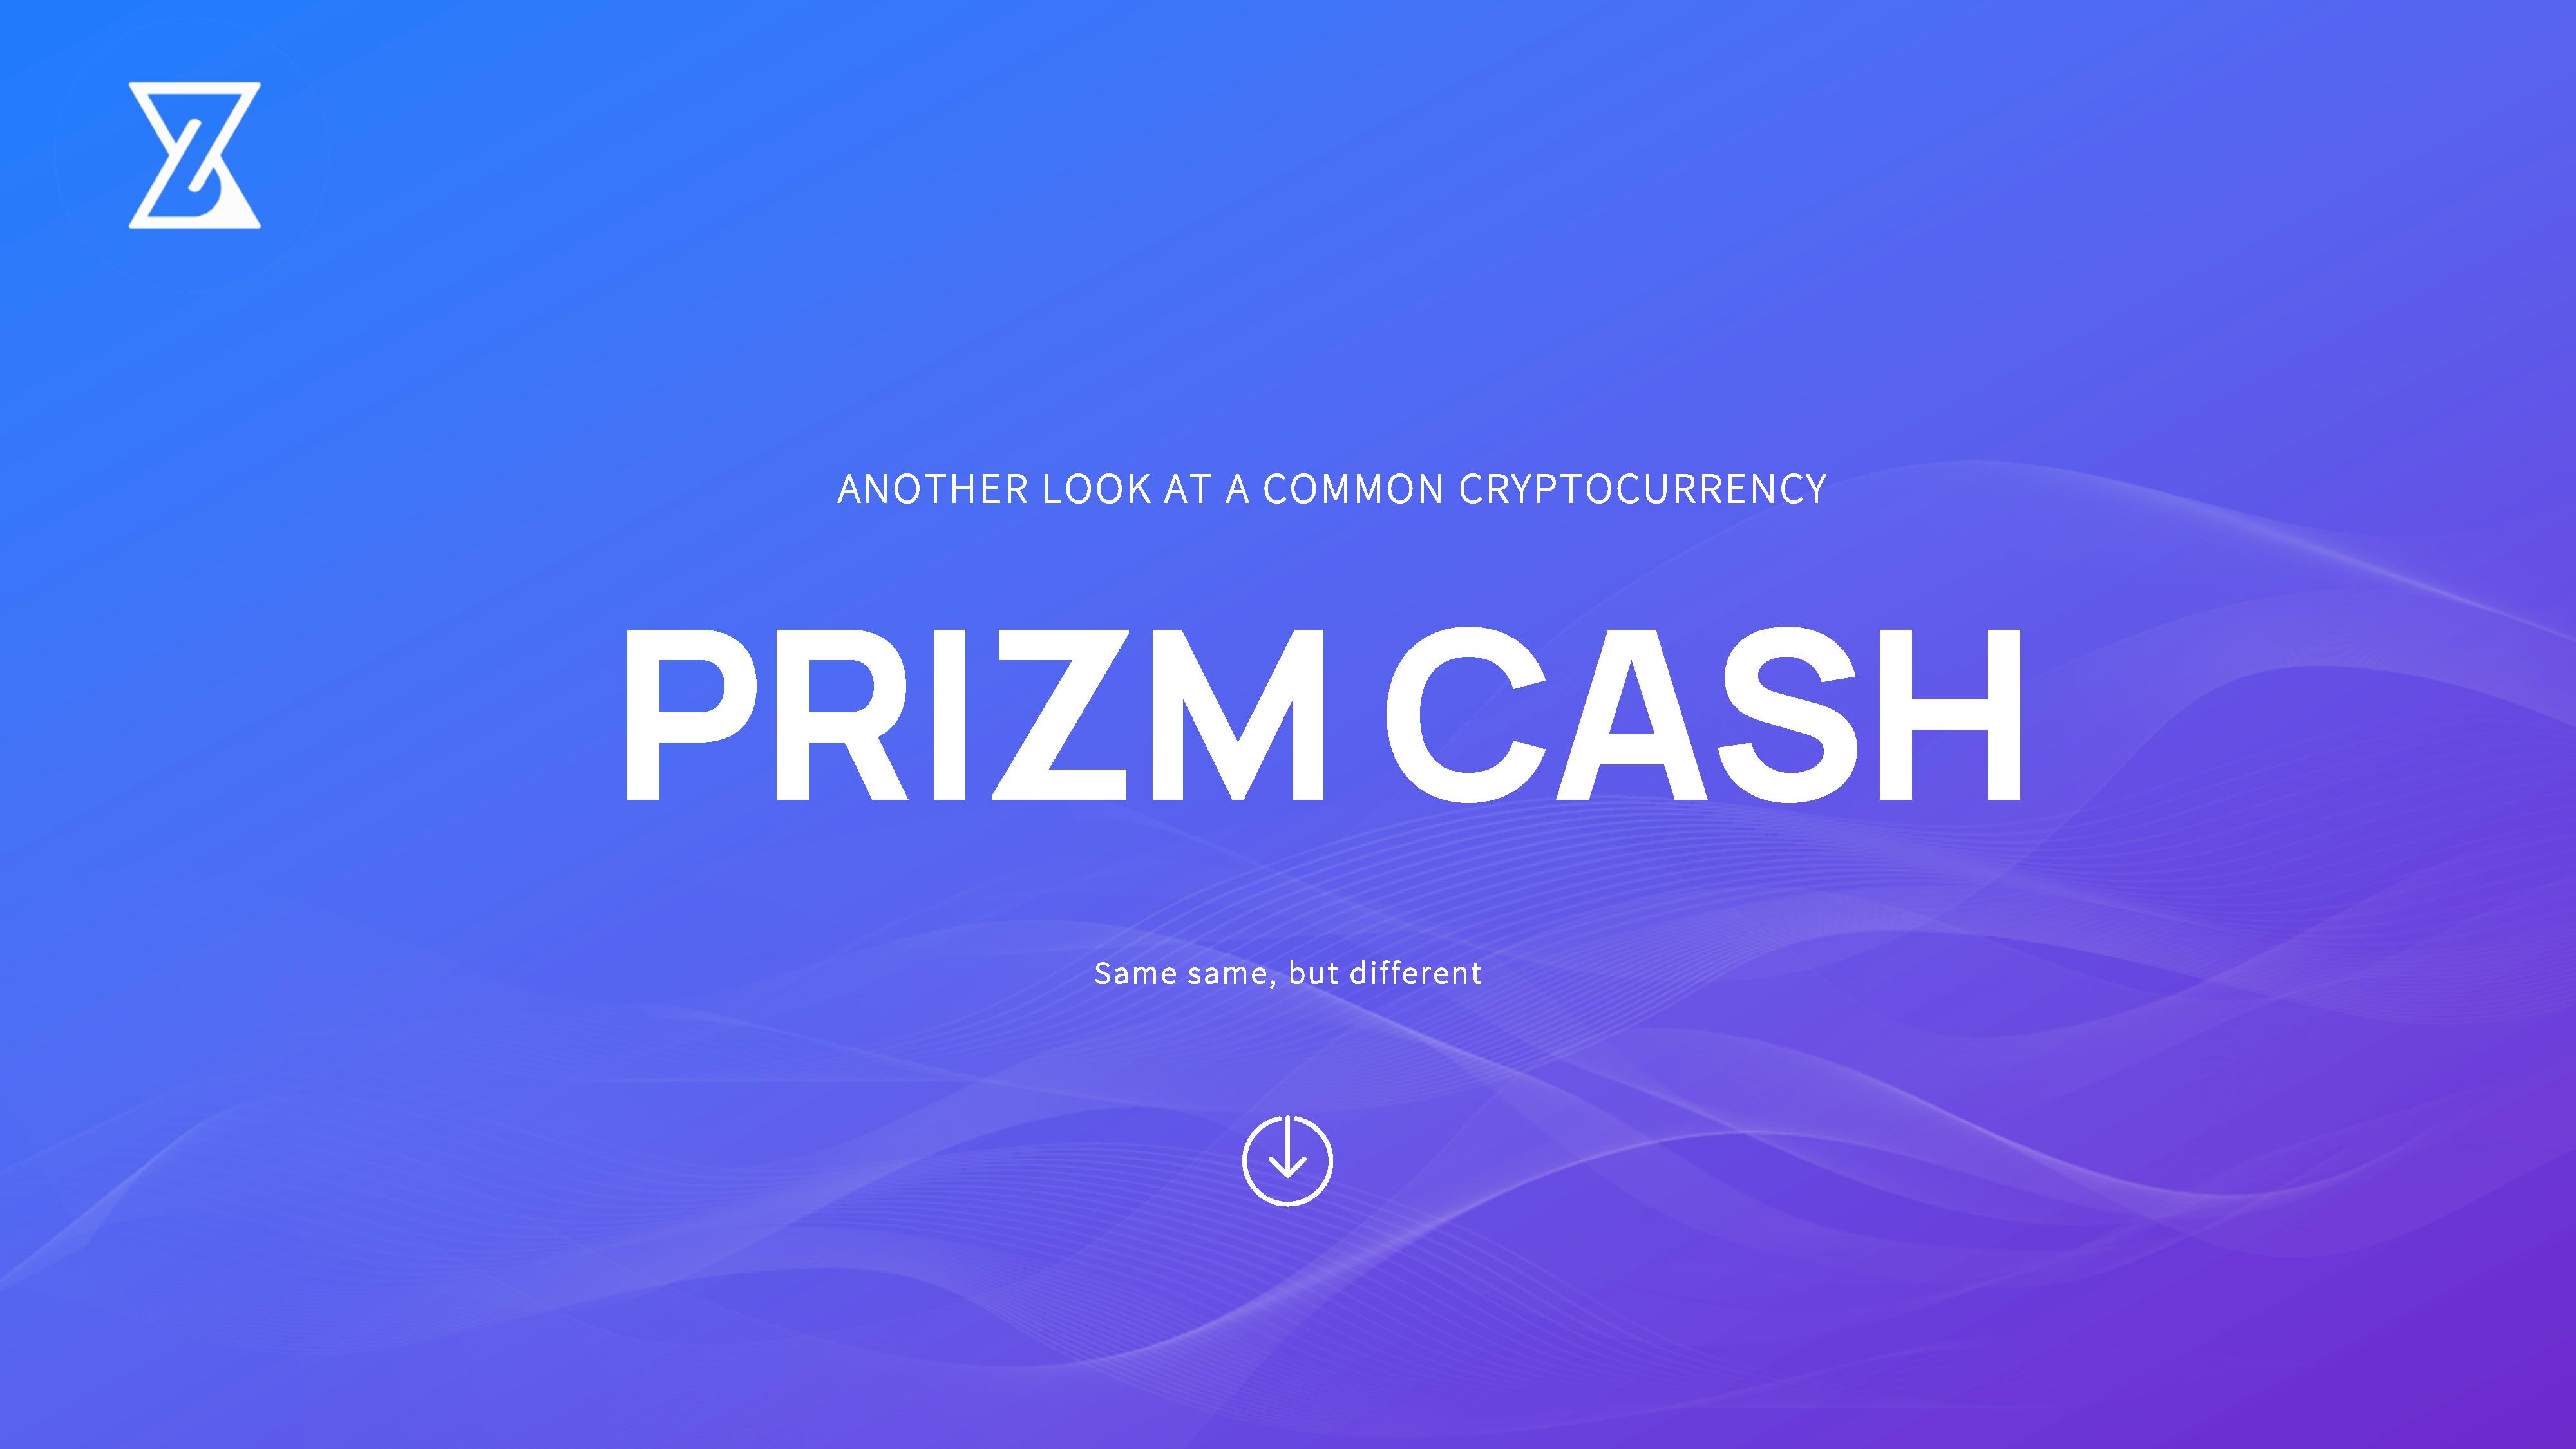 {filename}-[ann] Prizm Cash - Same Same, But Different